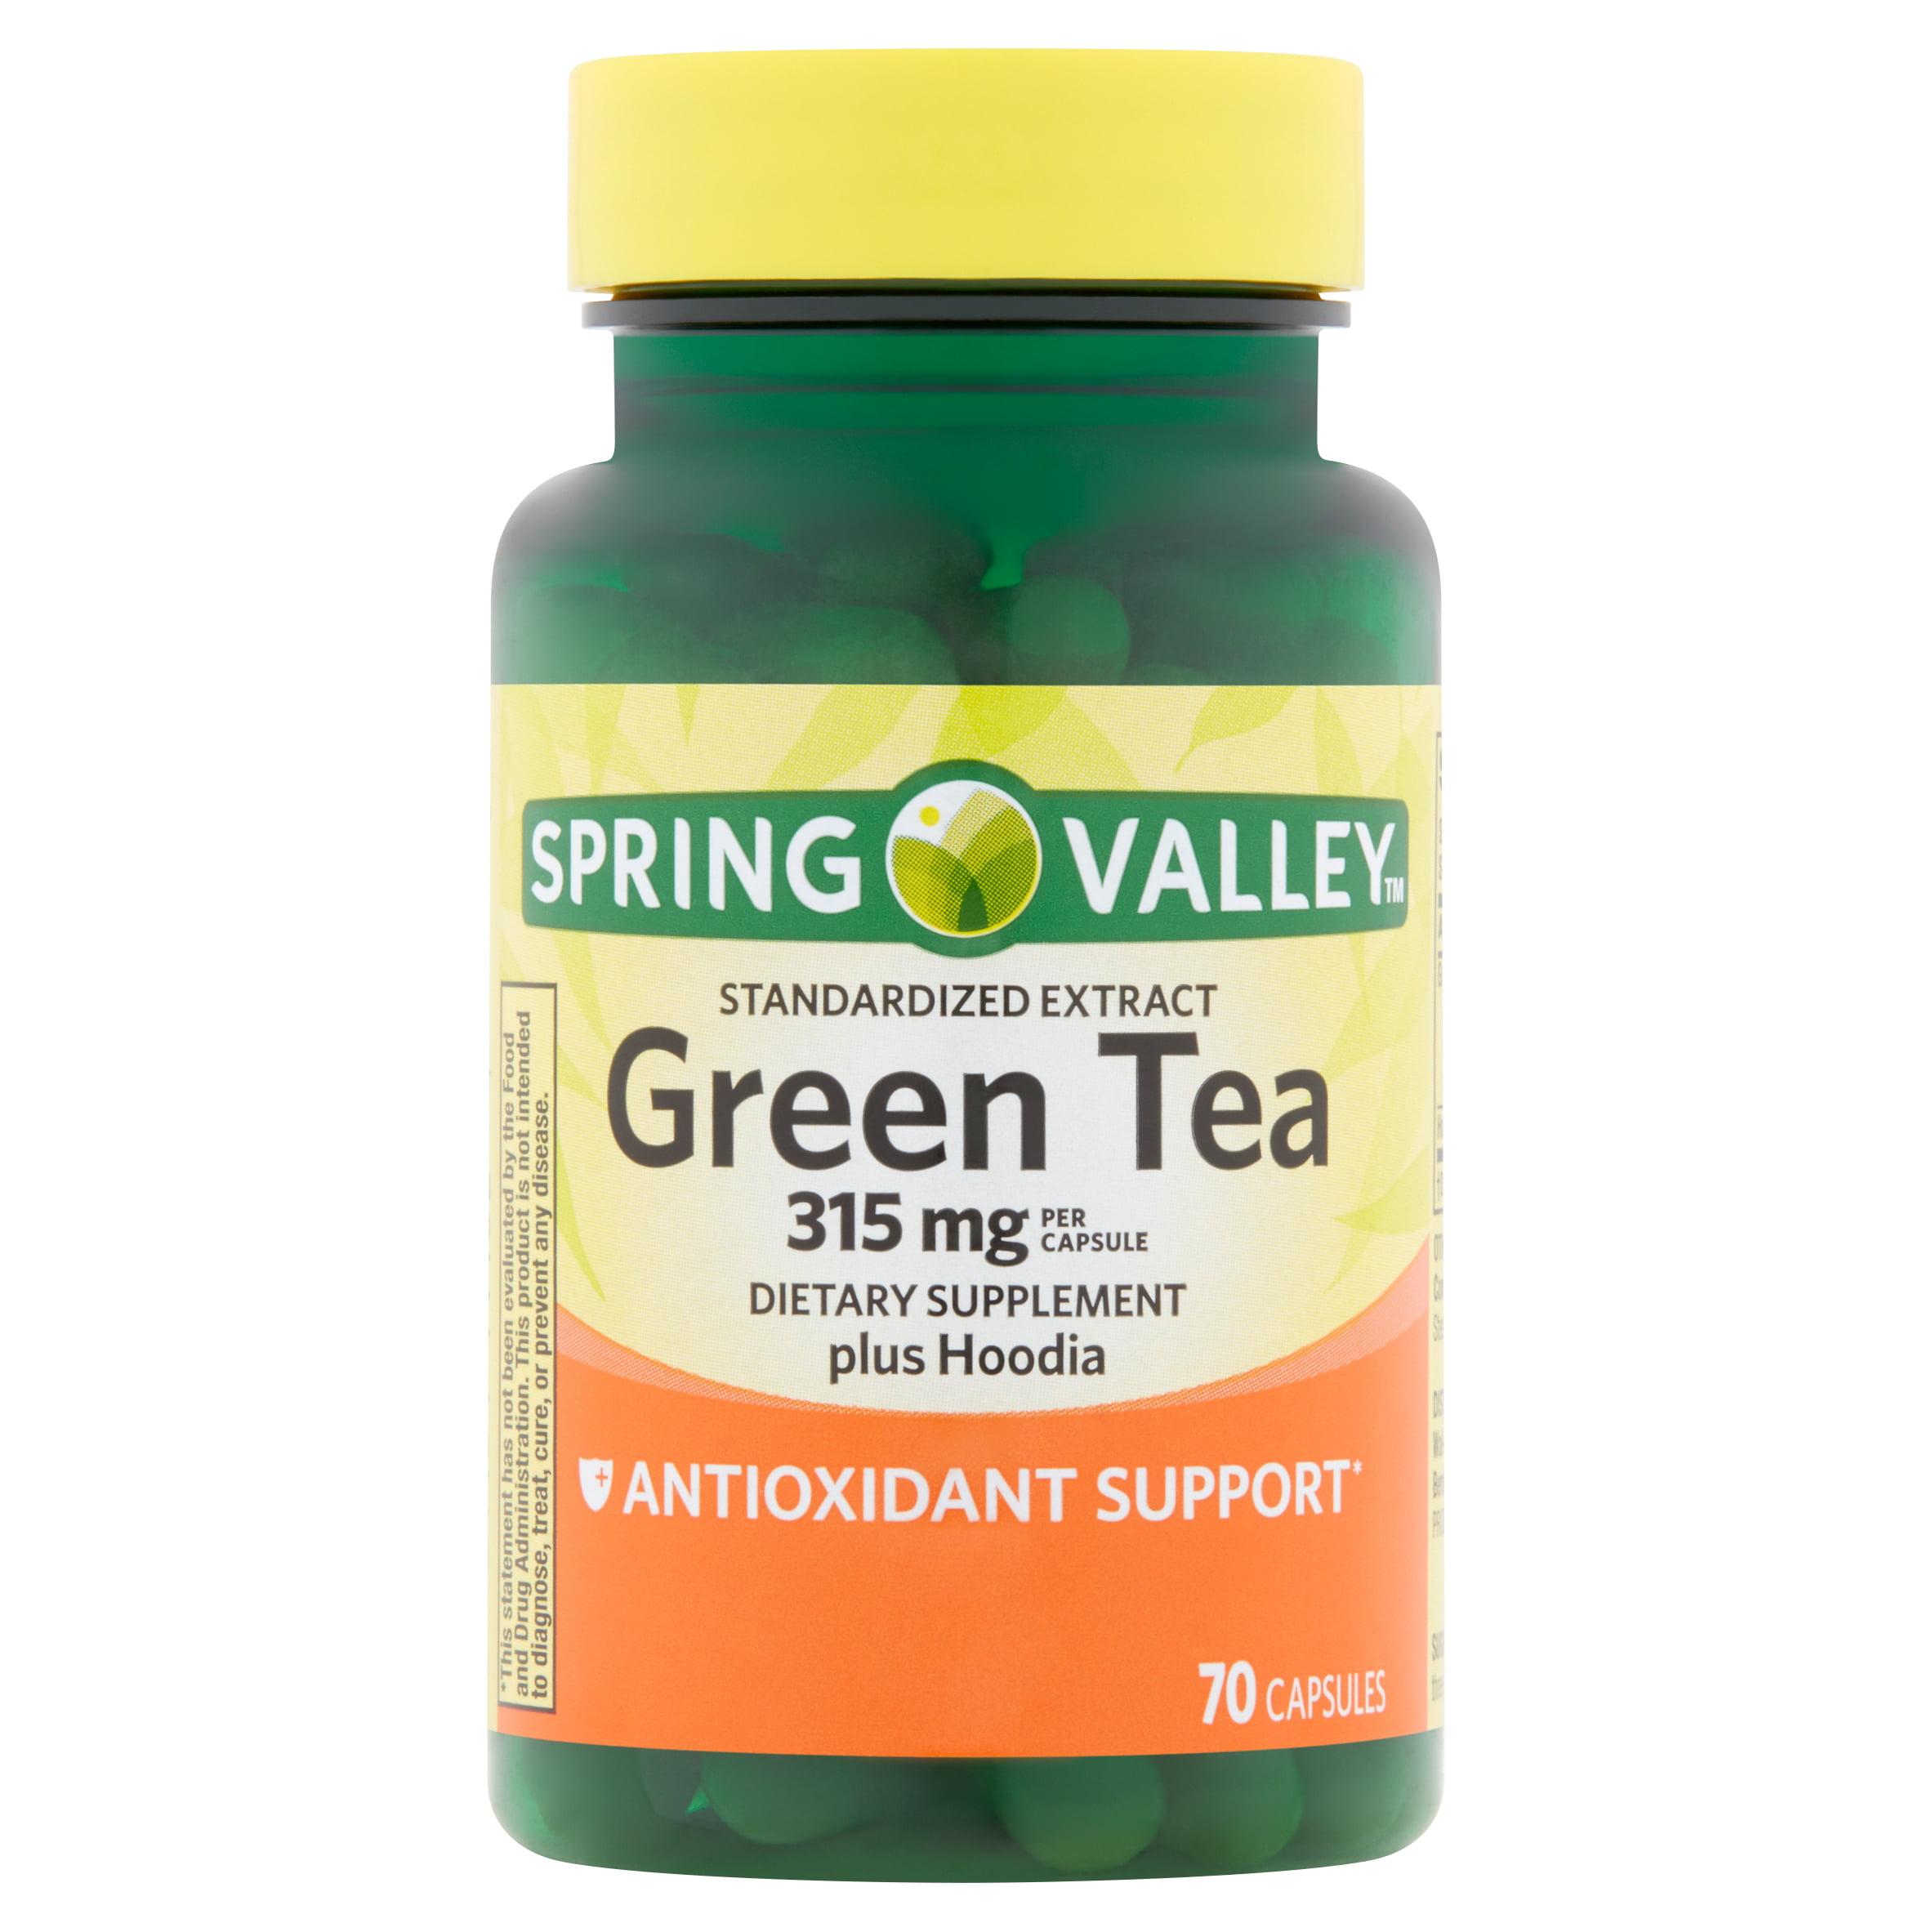 Spring Valley Standardized Extract Green Tea Plus Hoodia Capsules